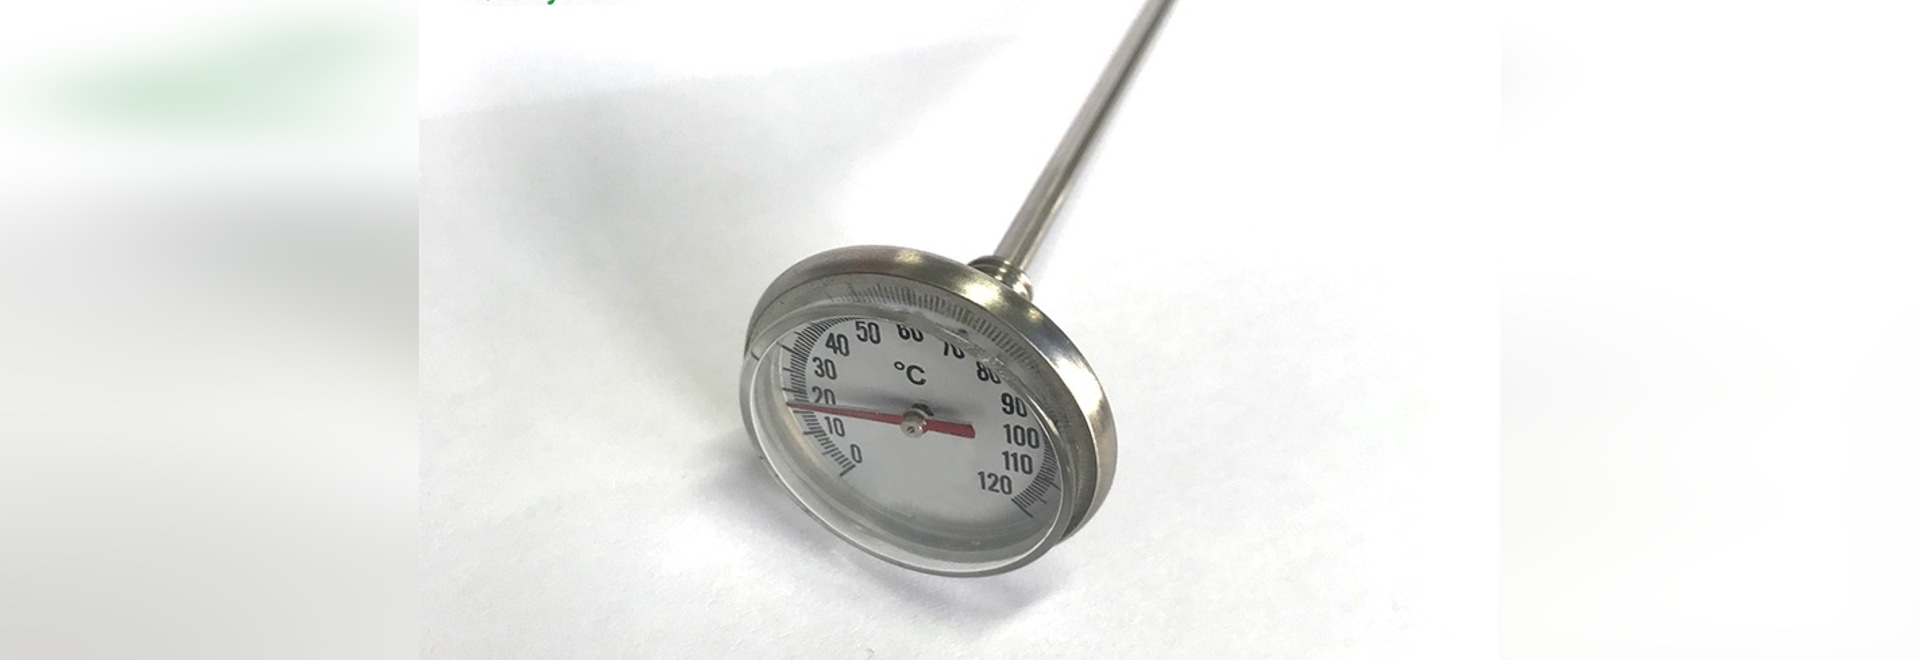 Maintenance & Caution Of Bimetal Thermometer